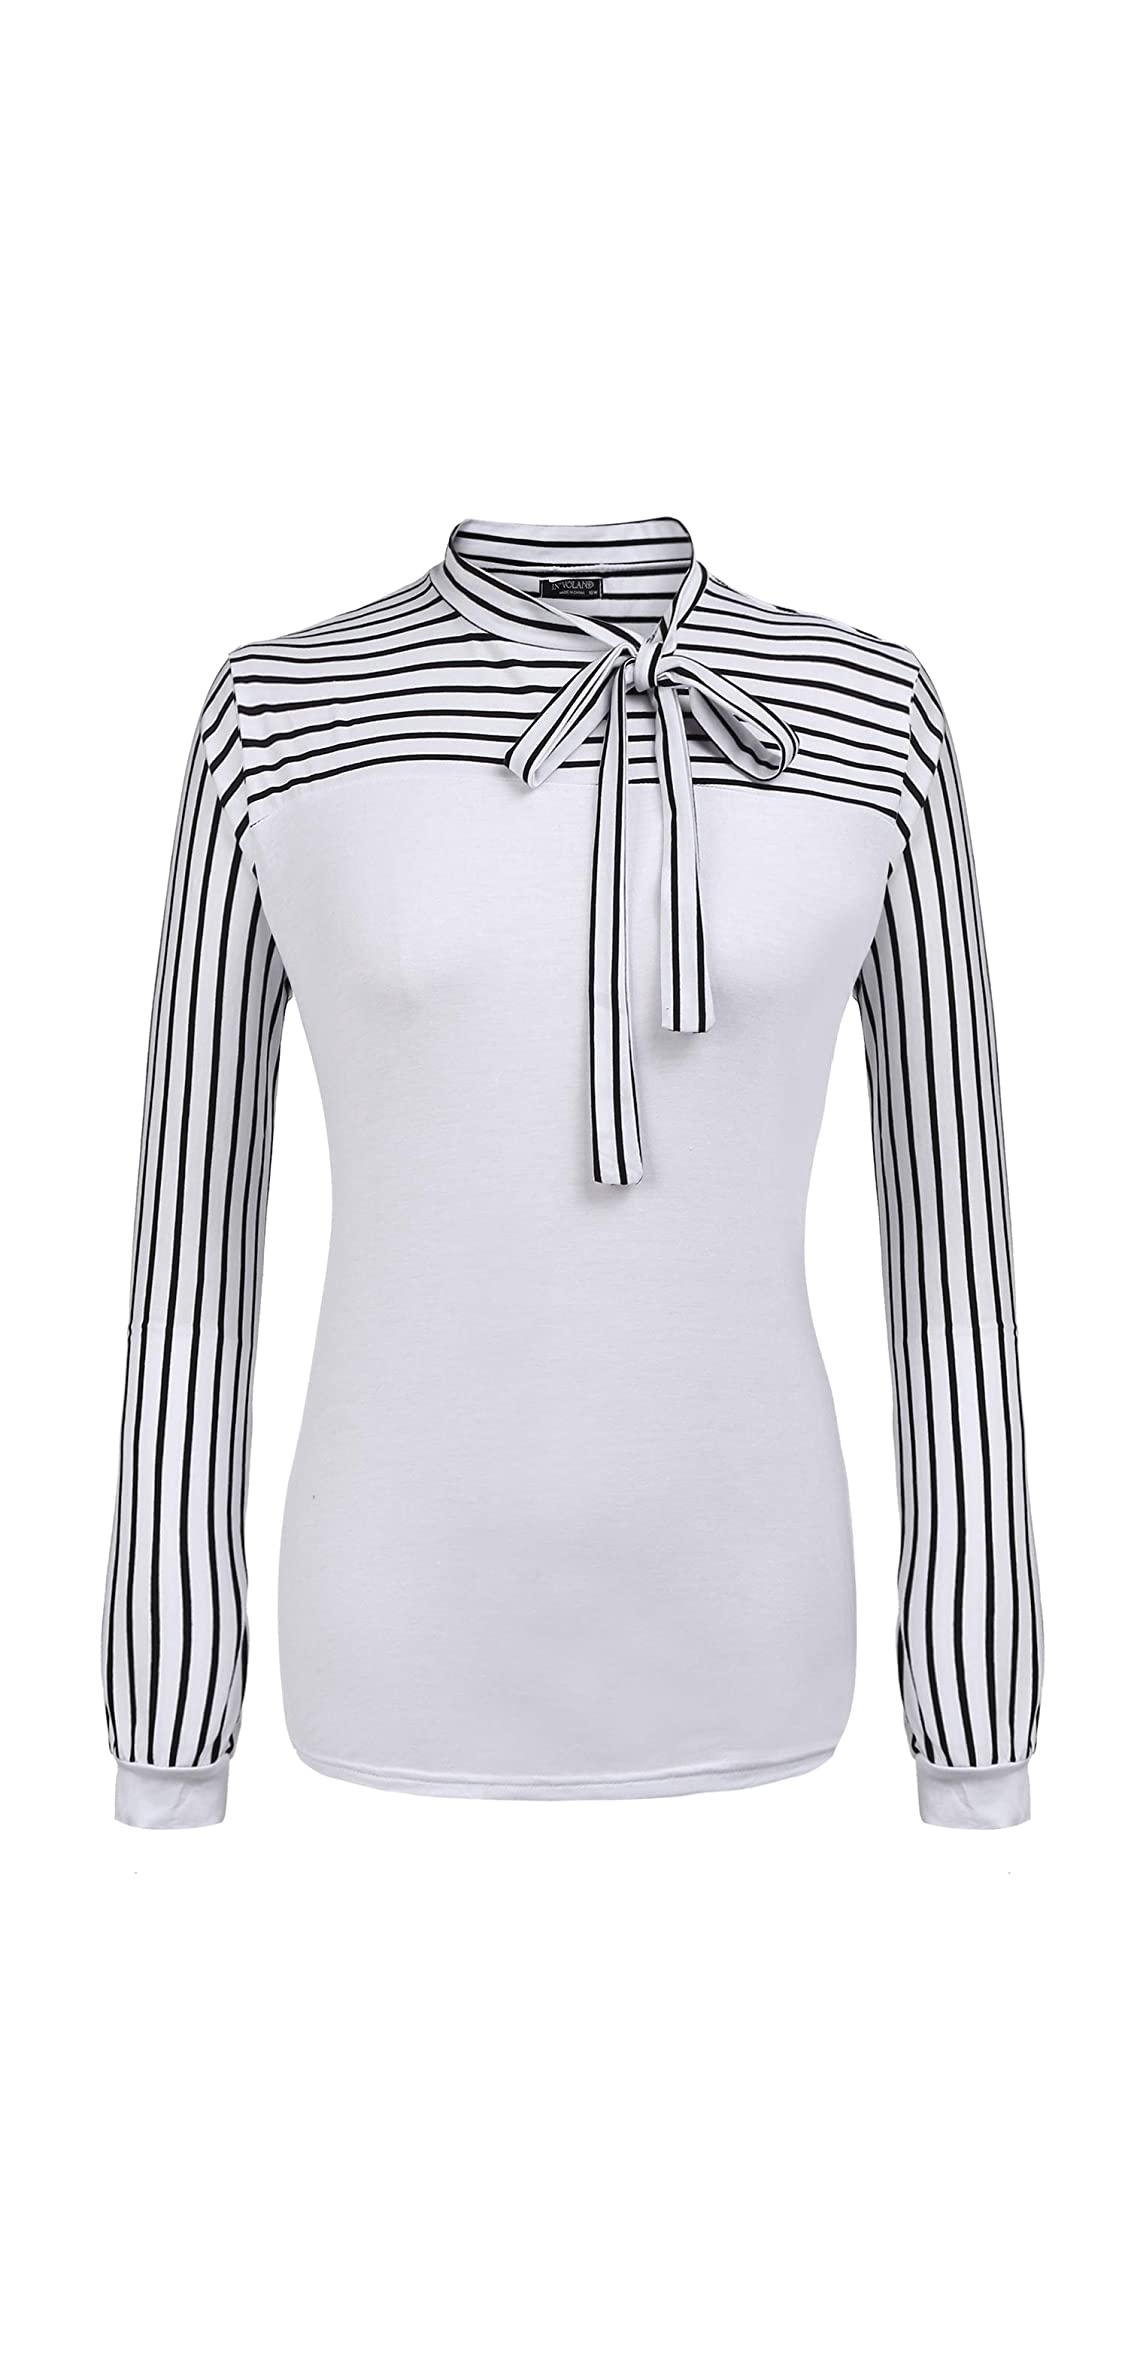 Plus Size Blouses For Women Tie-bow Neck Striped Blouse Long